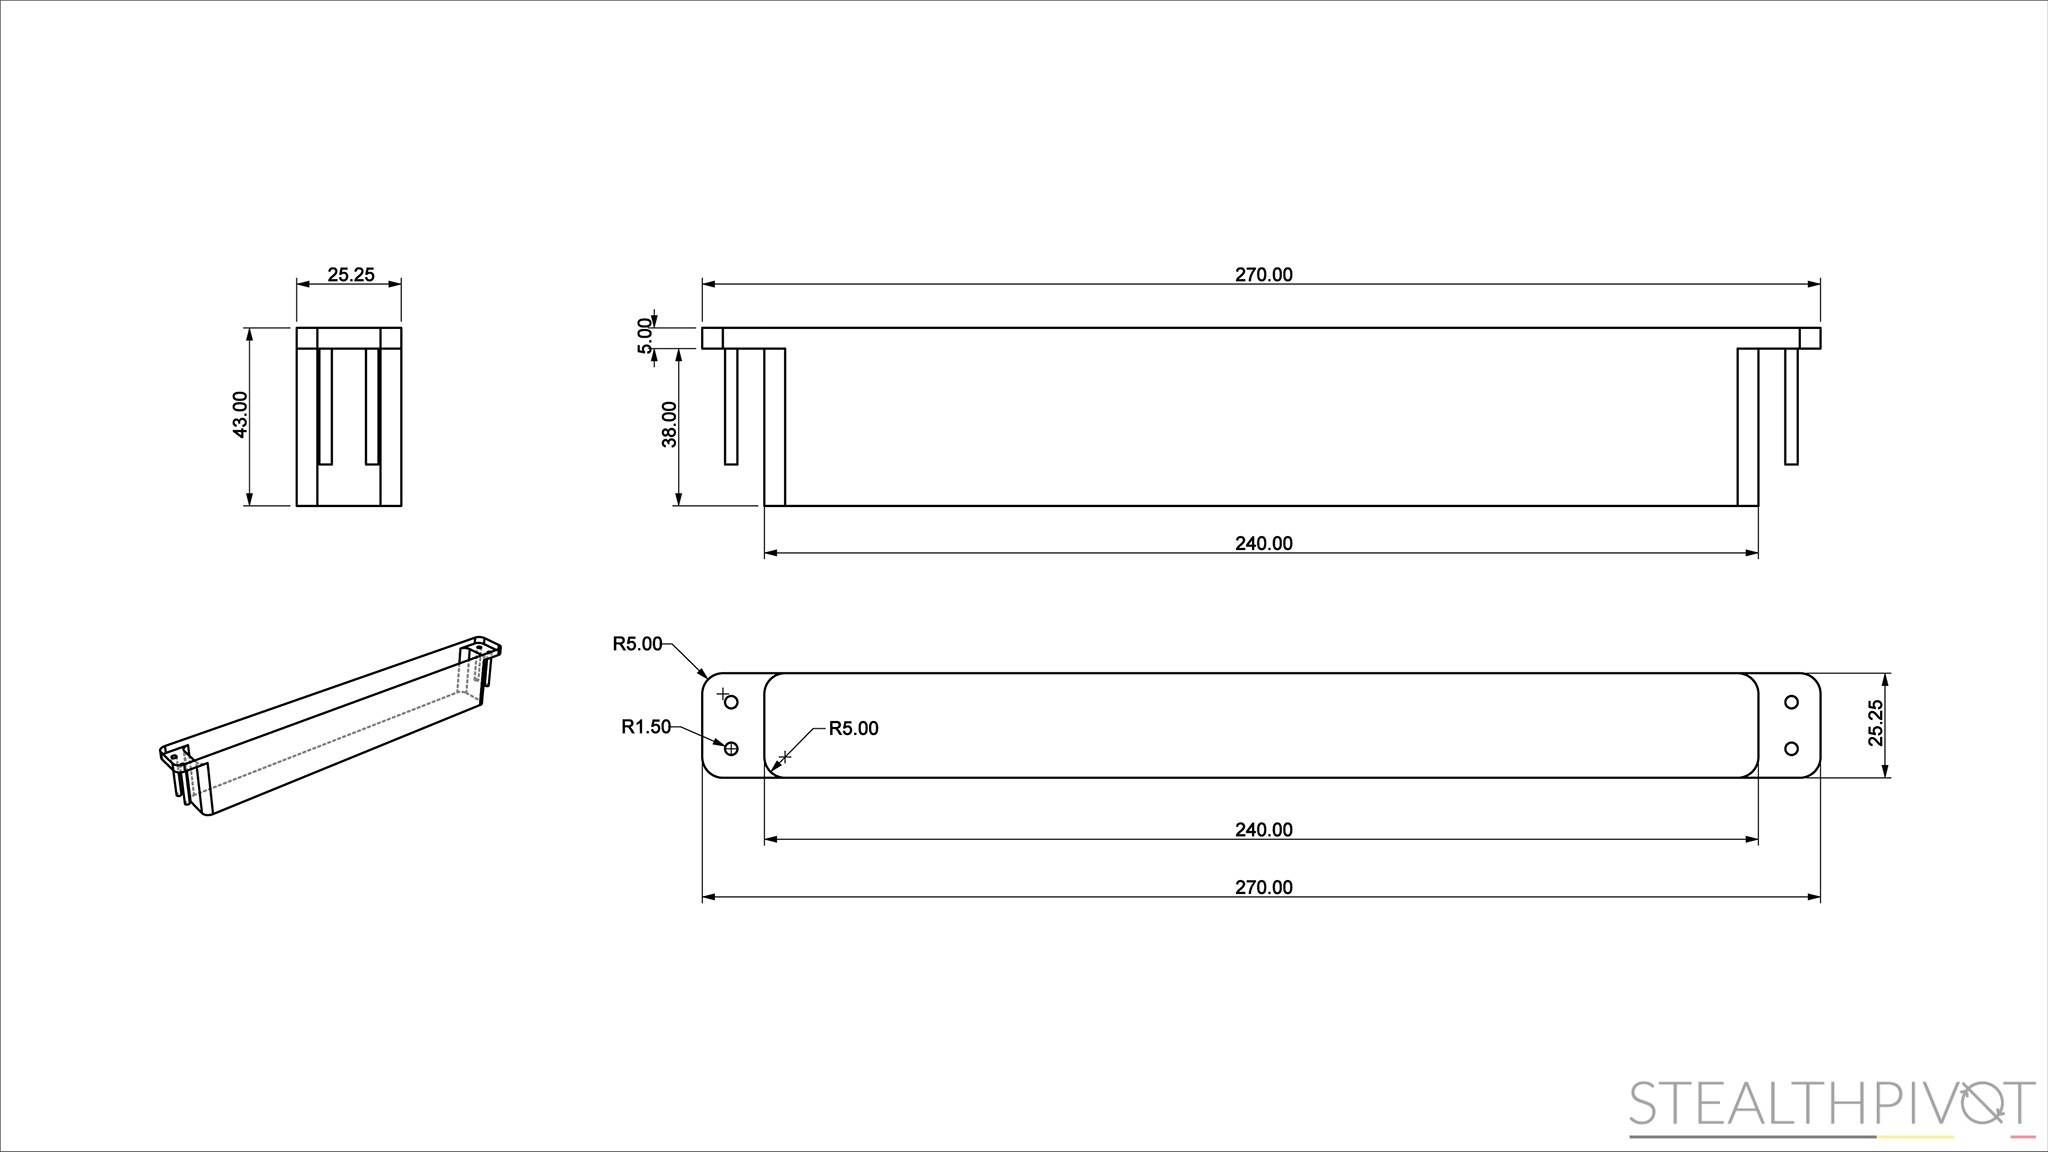 Stealth Pivot XL dimensions